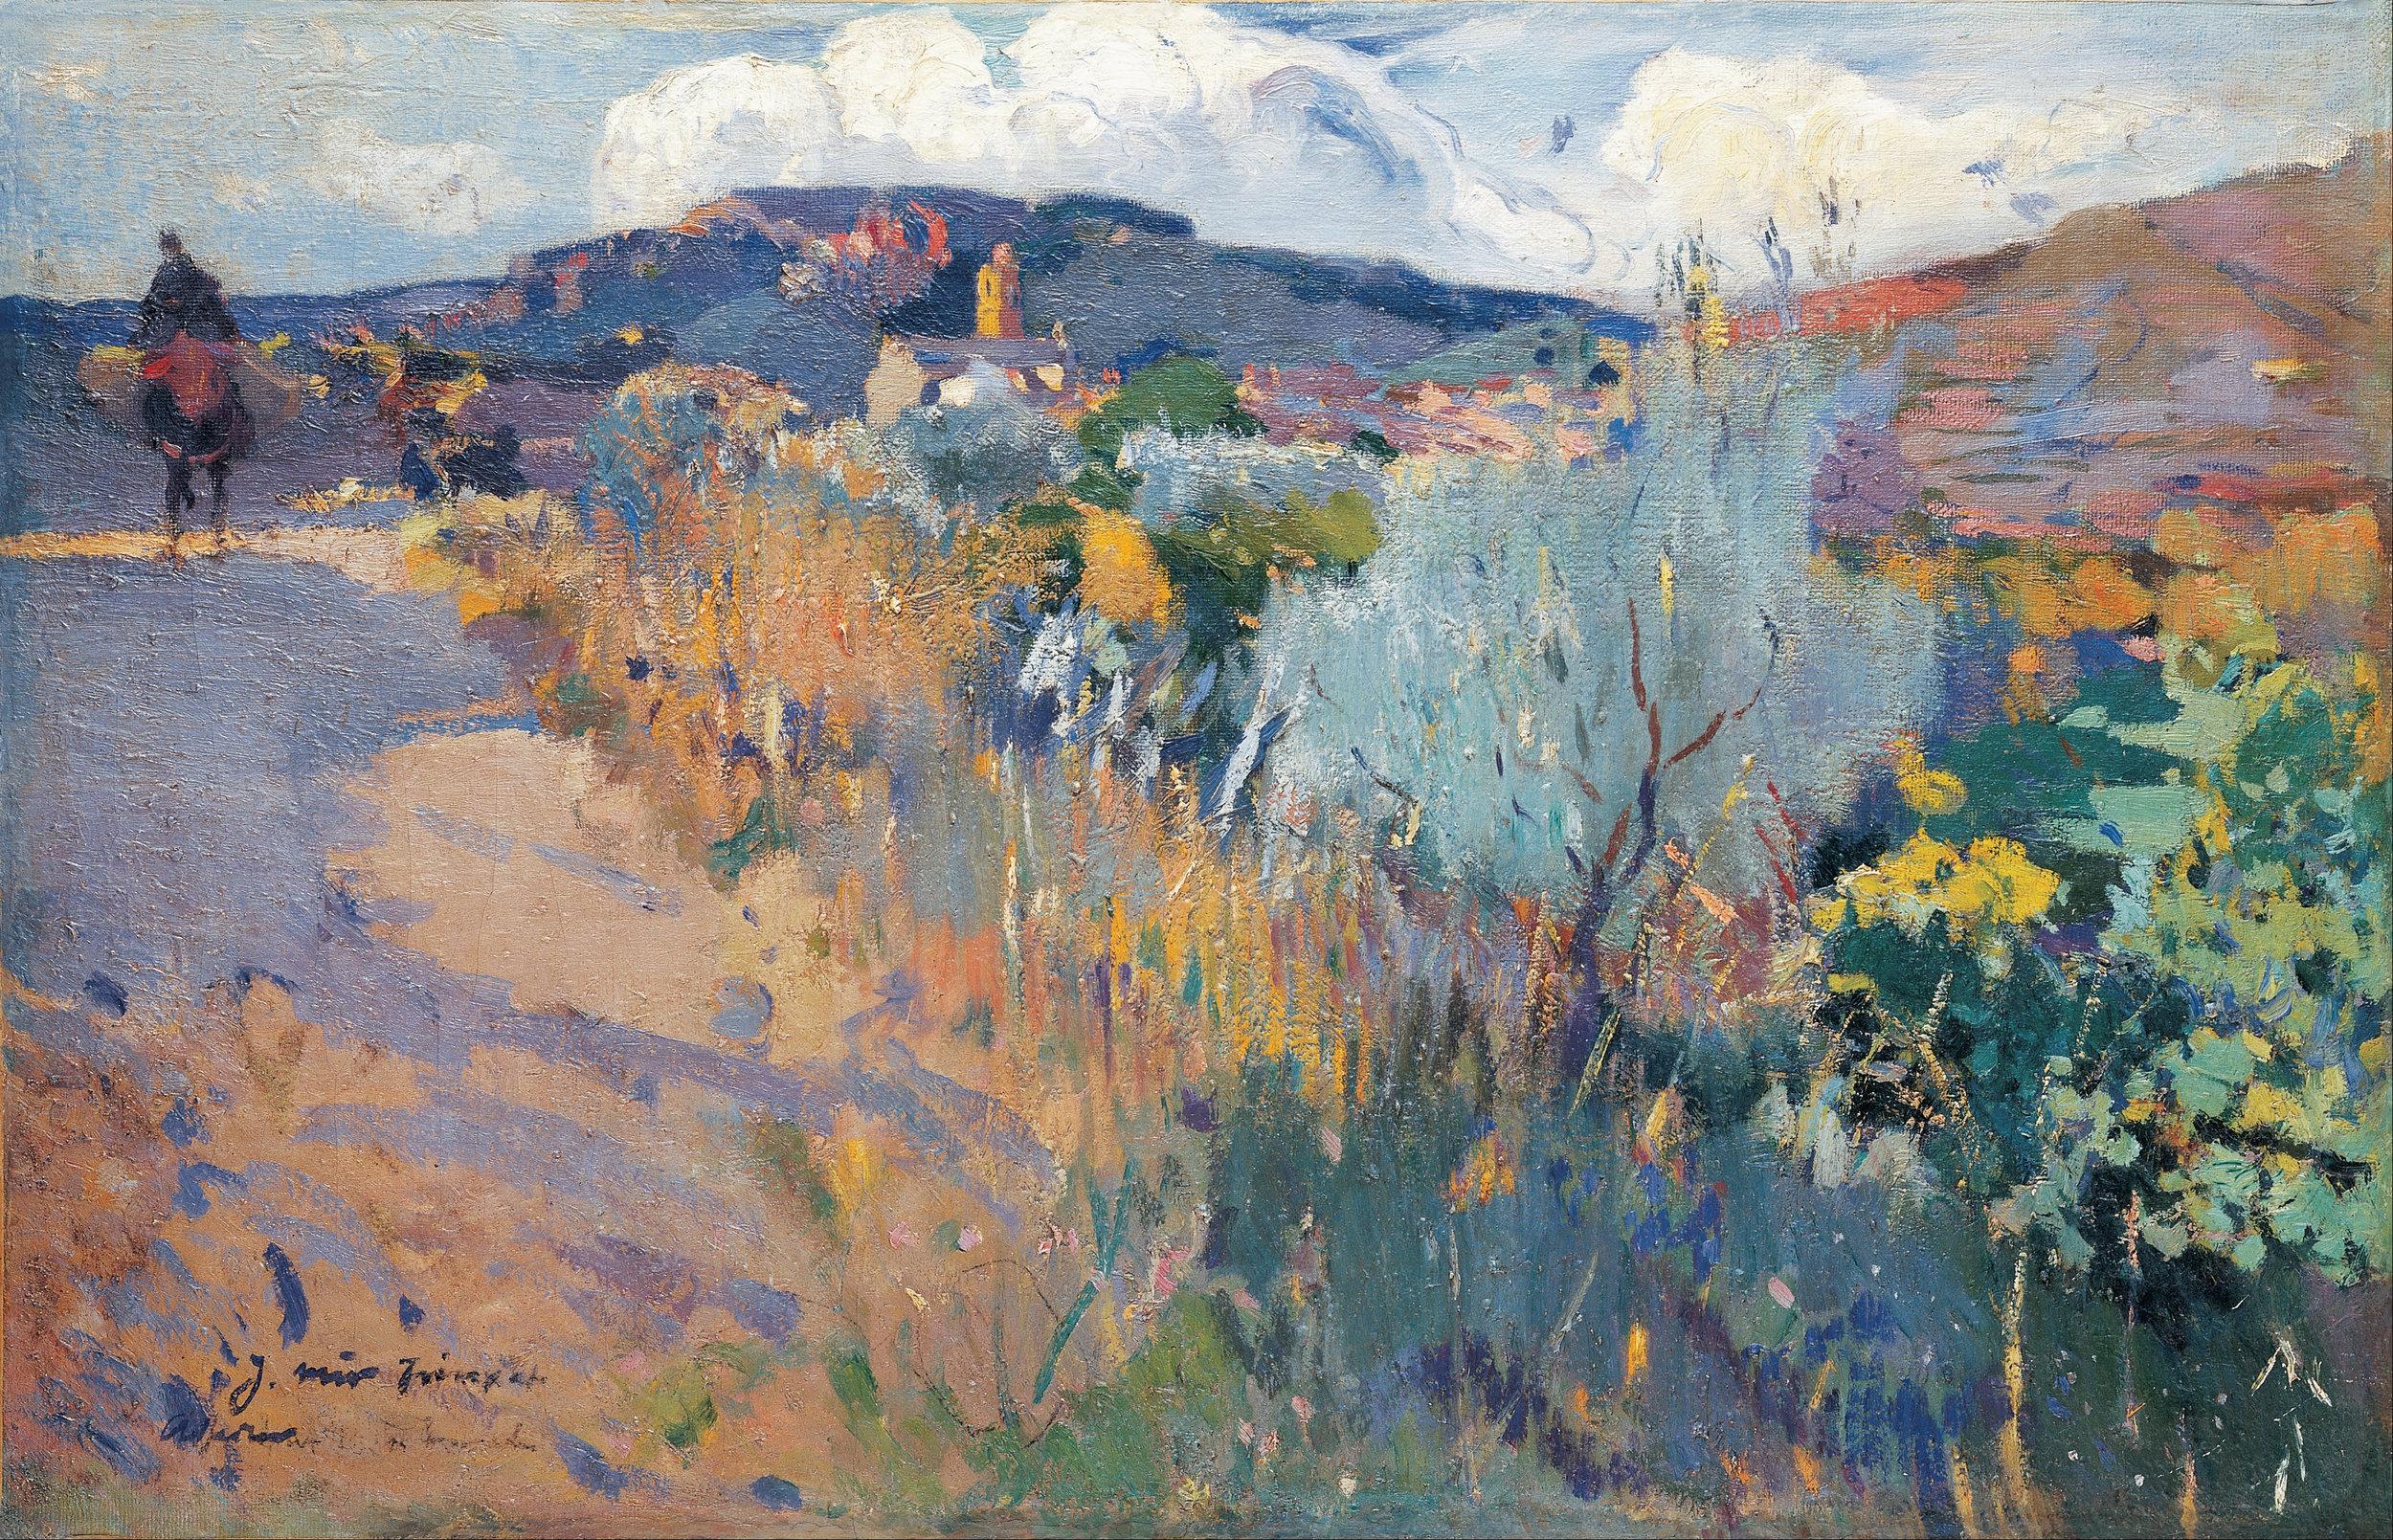 View of L'Aleixar , (c. 1915-1919), Joaquin Mir, (Image courtesy of Bilbao Fine Arts Museum)